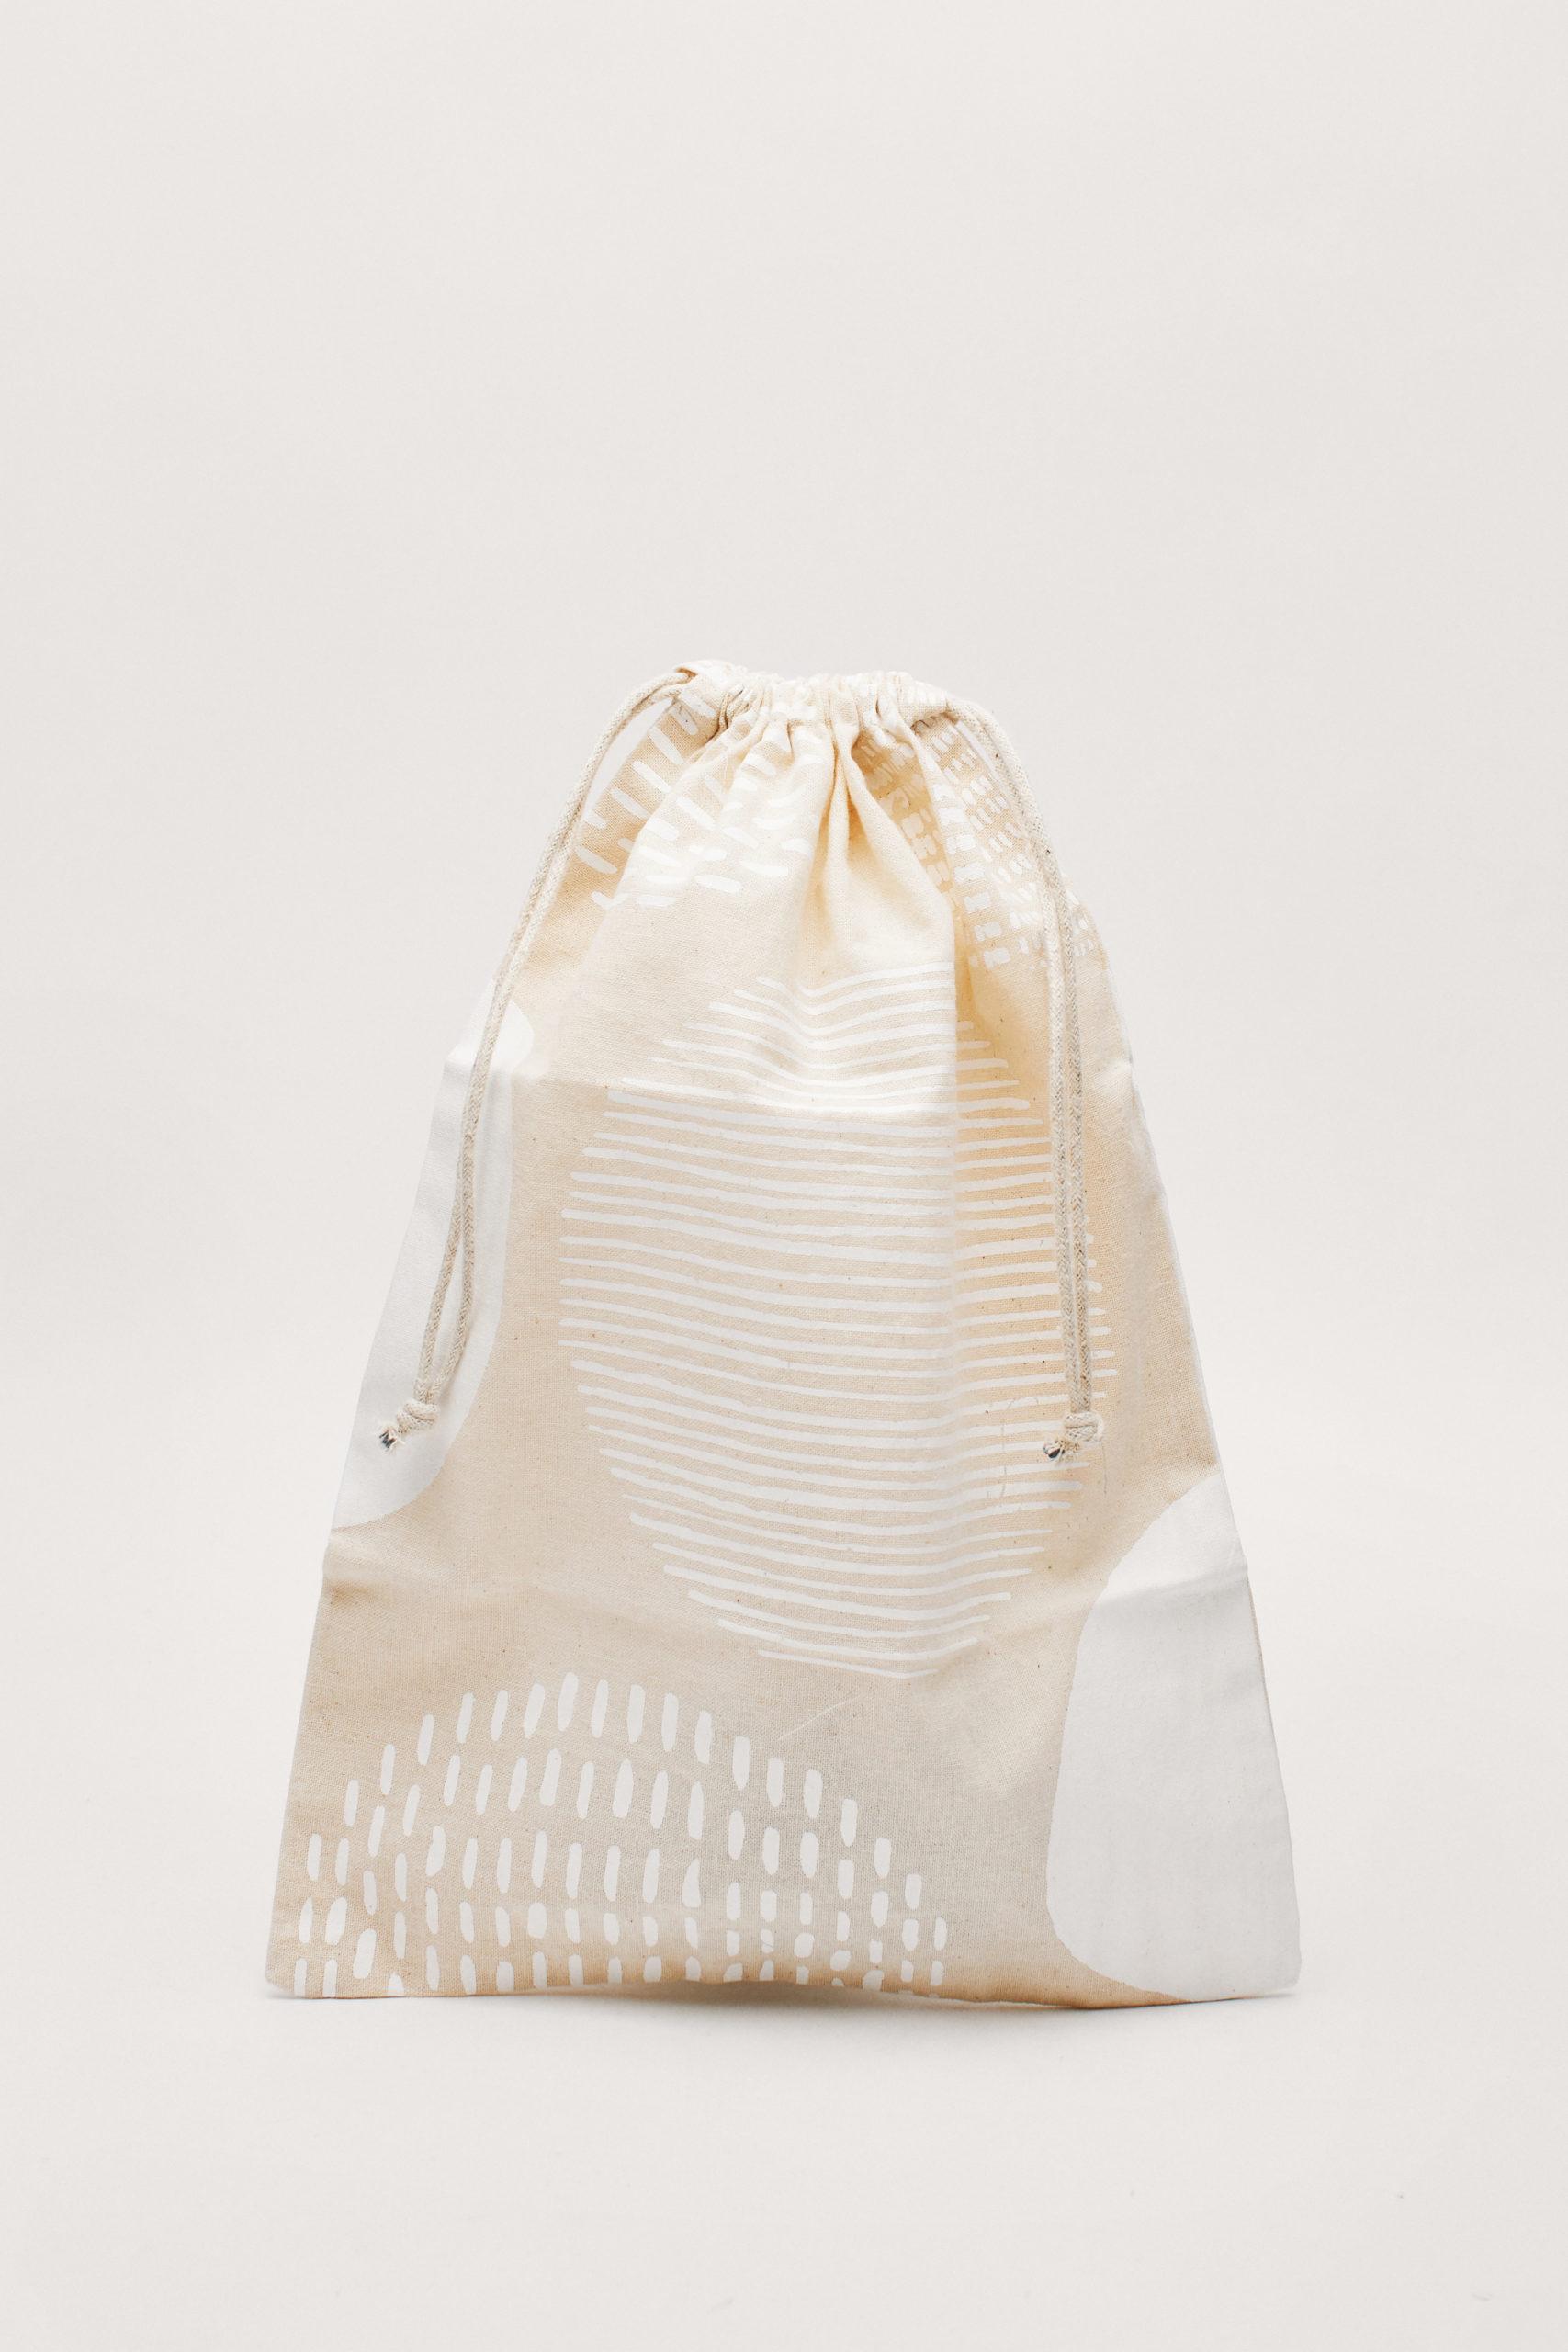 &Sisters 100% Organic Drawstring Bag